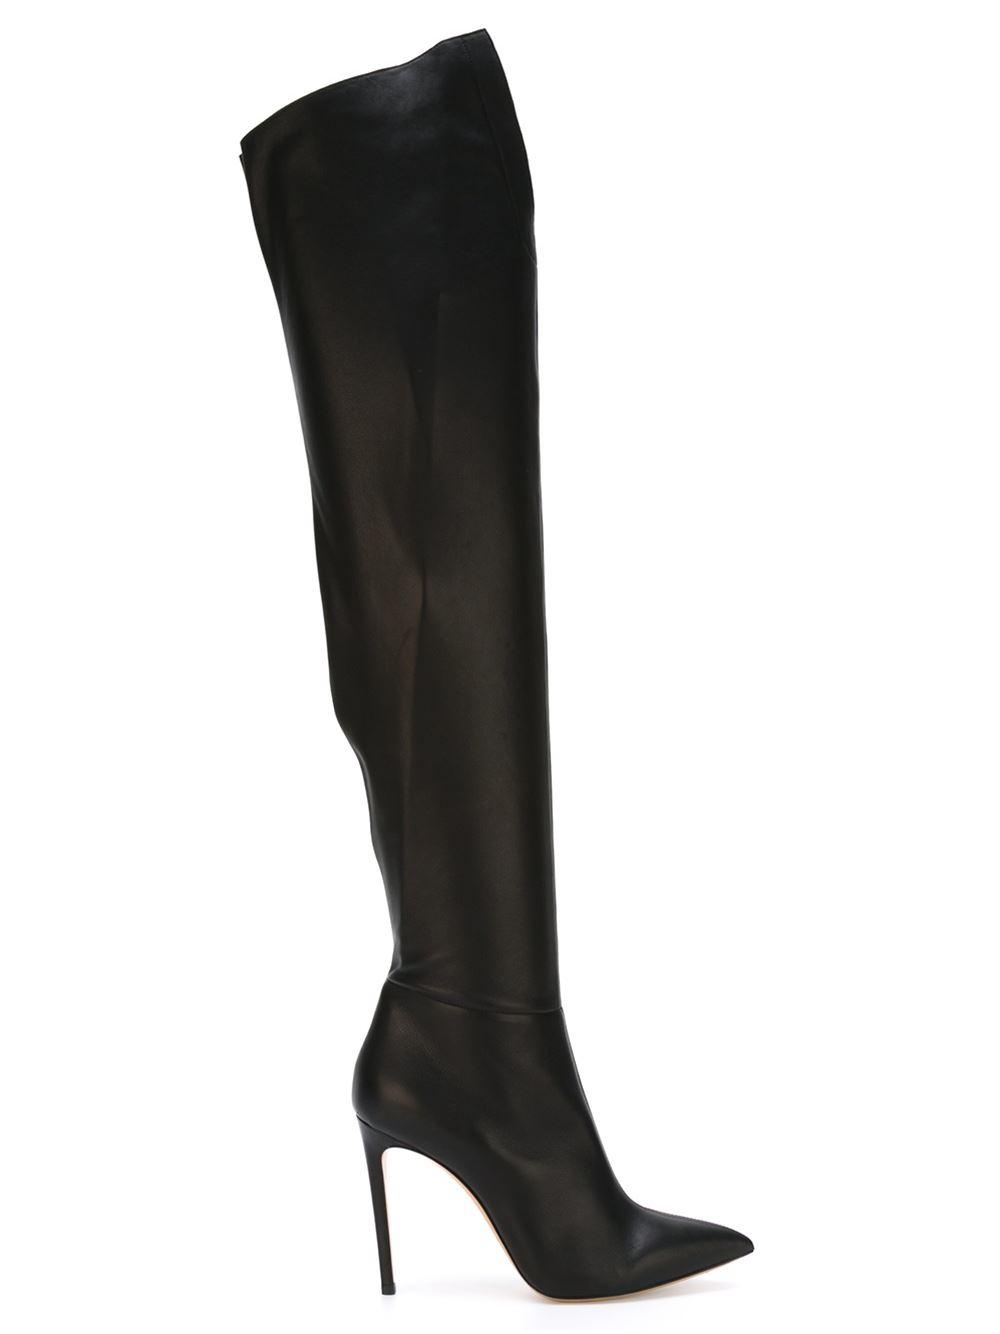 casadei thigh high stiletto boots in black lyst